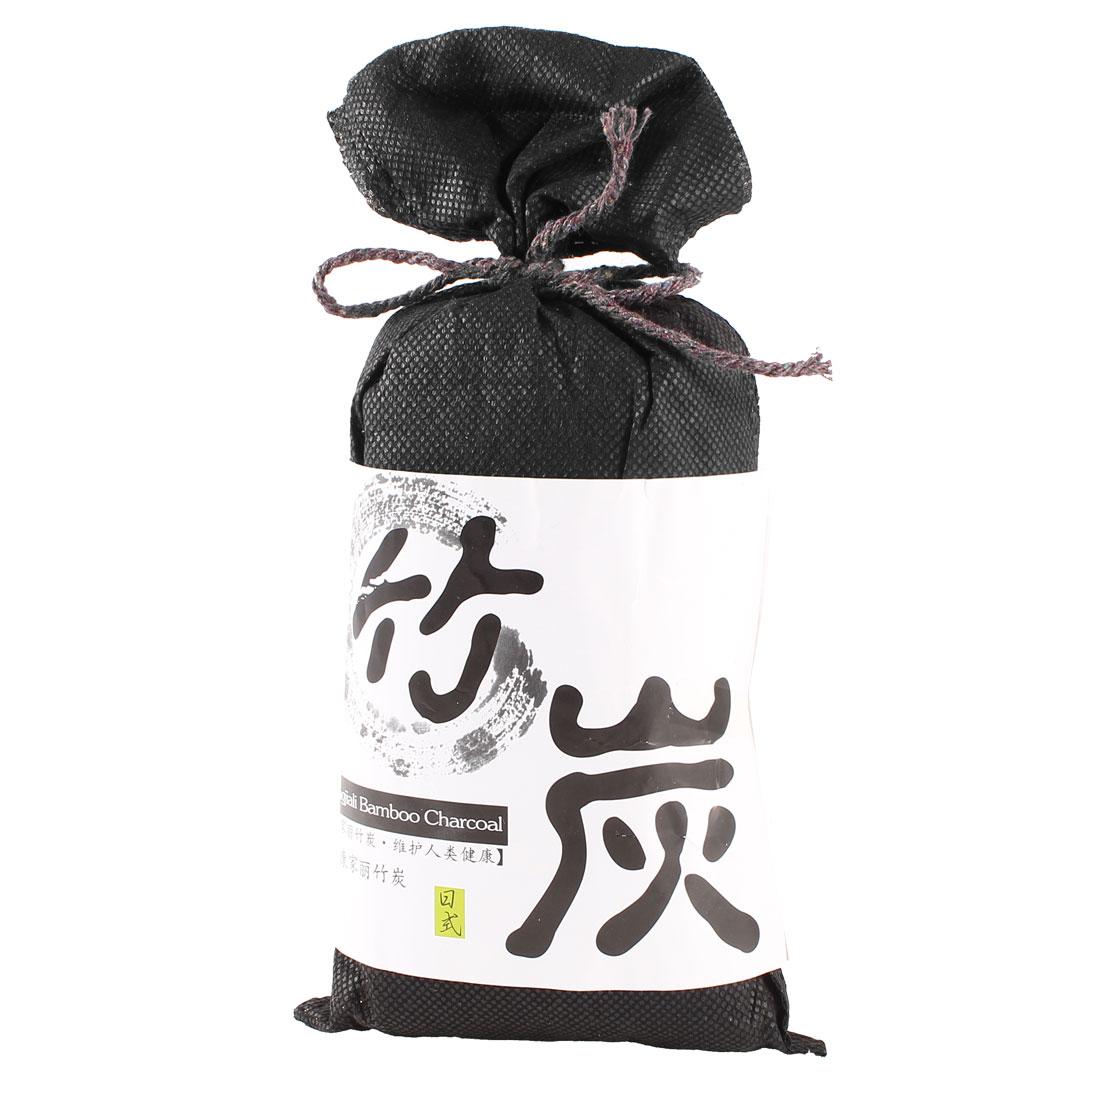 Black Bag Bamboo Charcoal Carbon Refresh Air Odor Freshener for Car